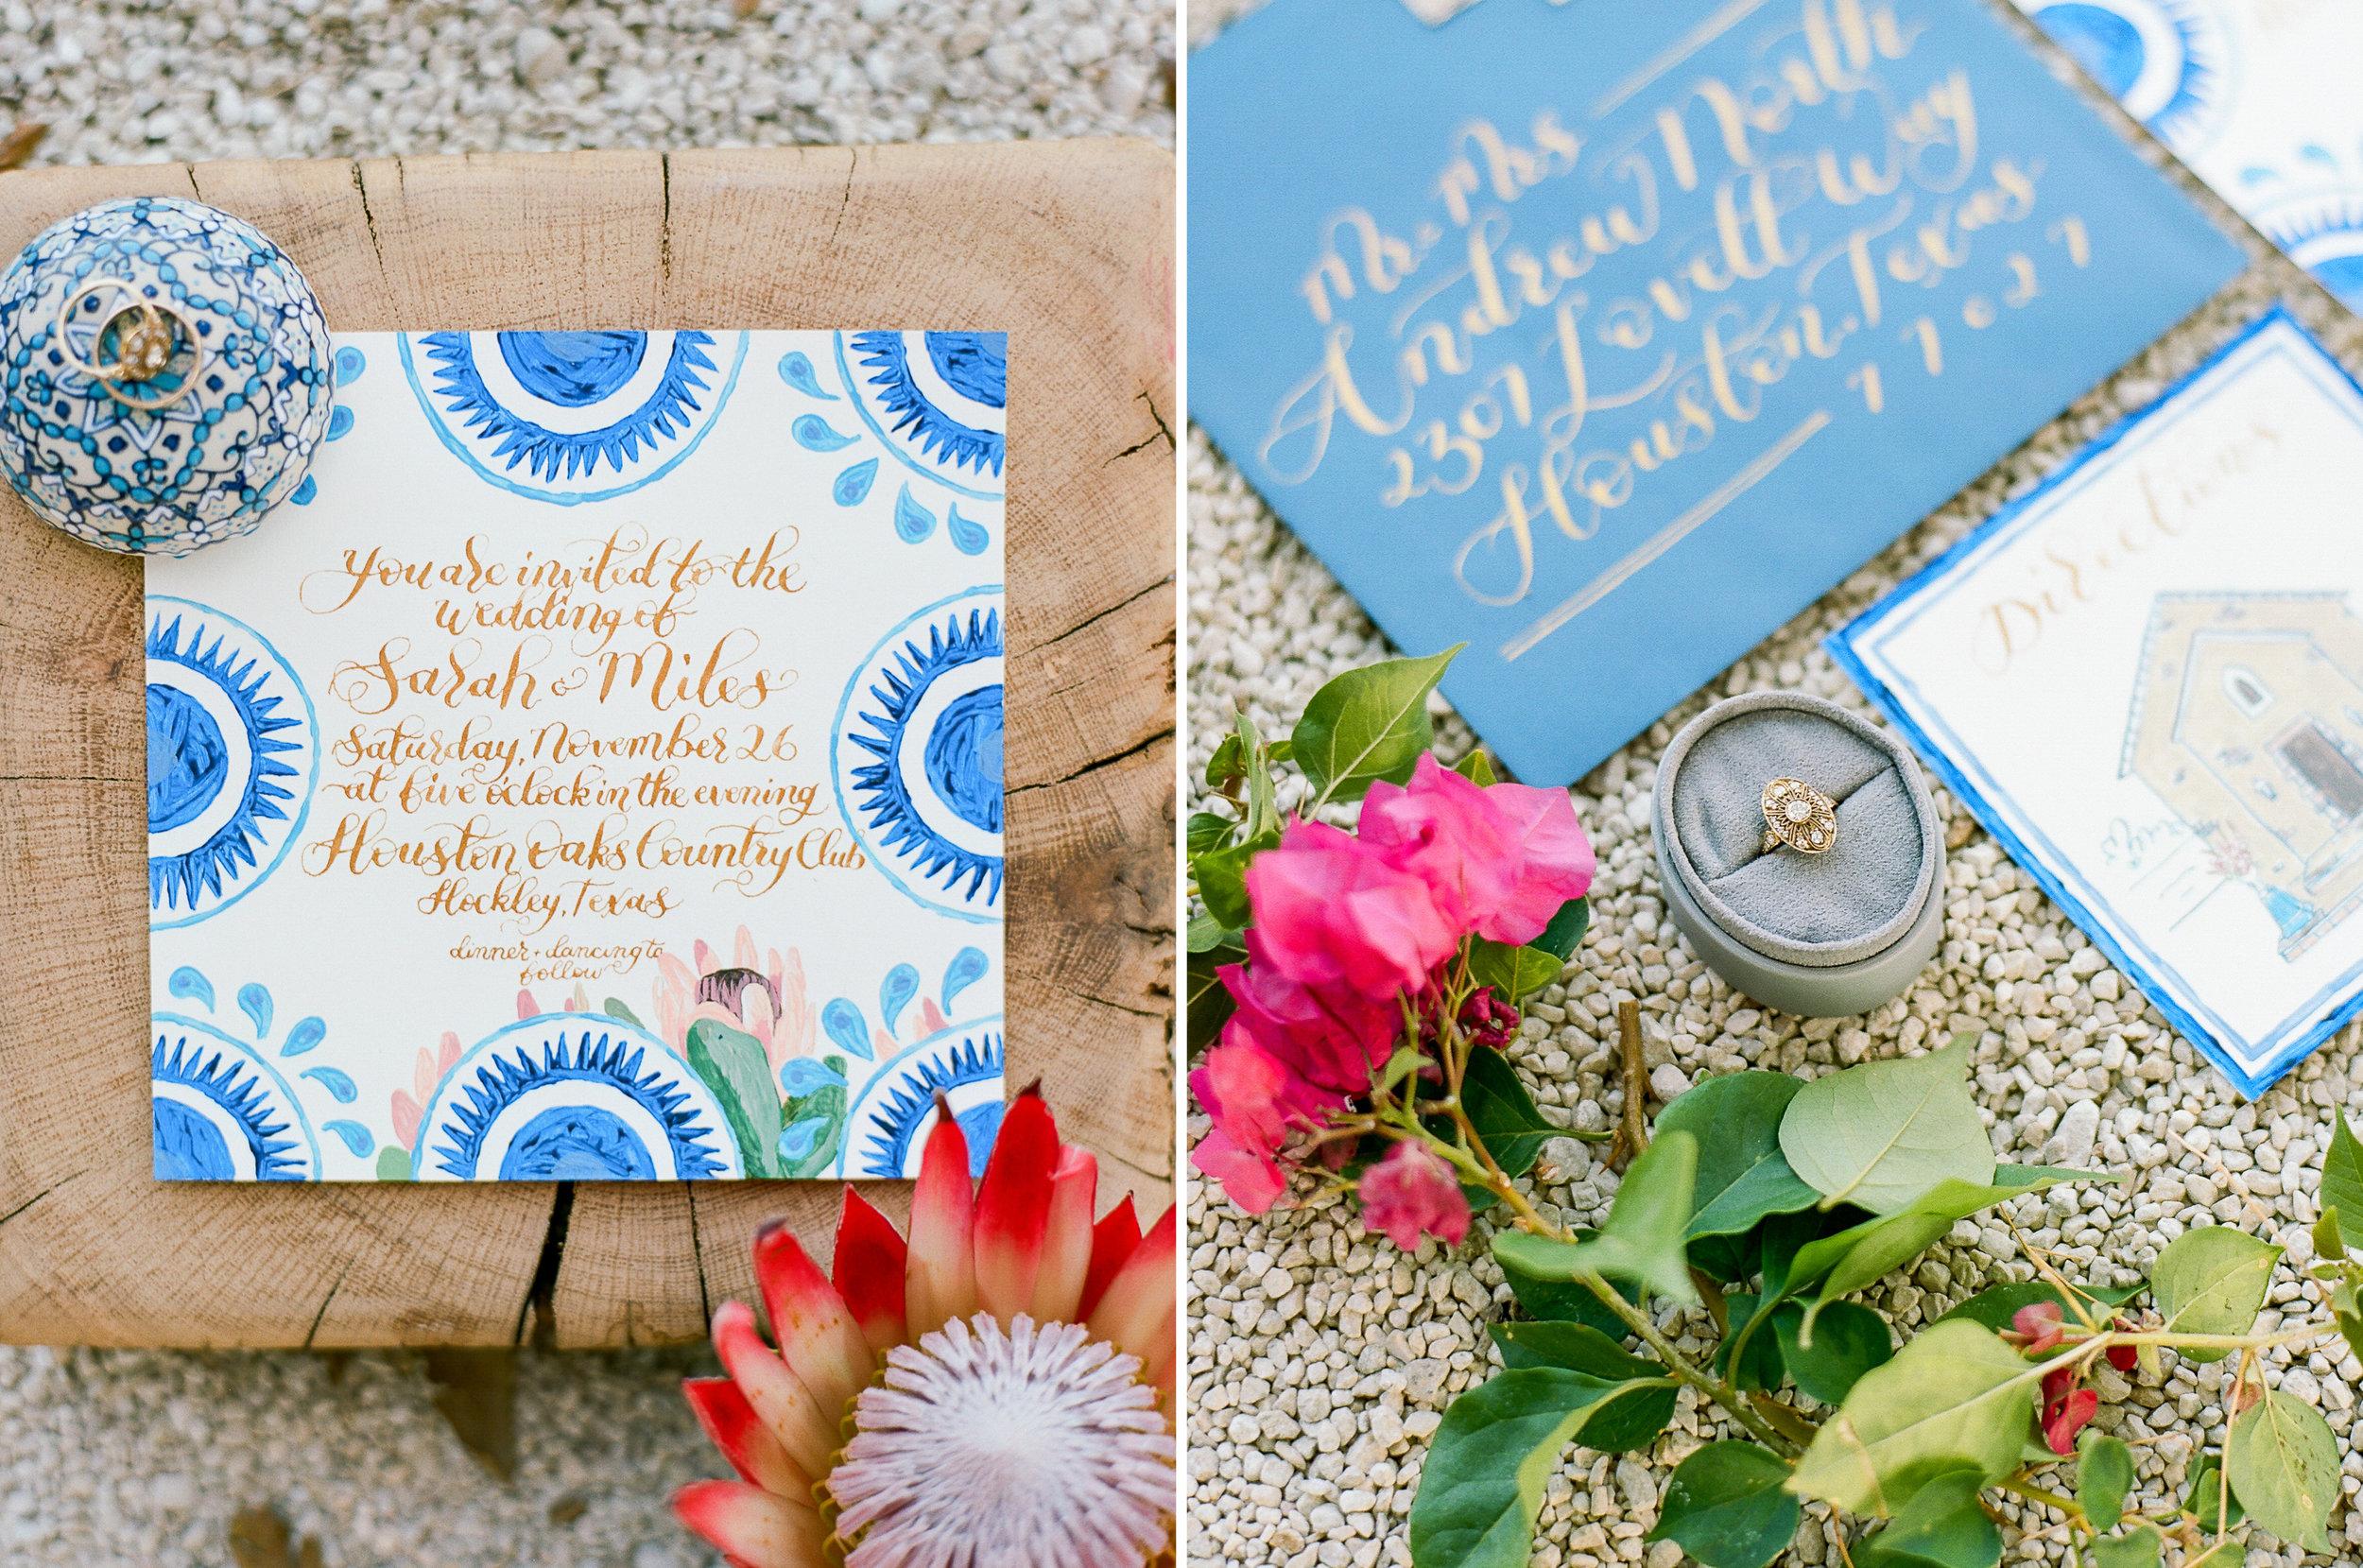 Top-Houston-Wedding-Photographer-Dana-Fernandez-Photography-The-Clubs-At-Houston-Oaks-Country-Club-Belle-Events-Film-Fine-Art-Destination-112.jpg